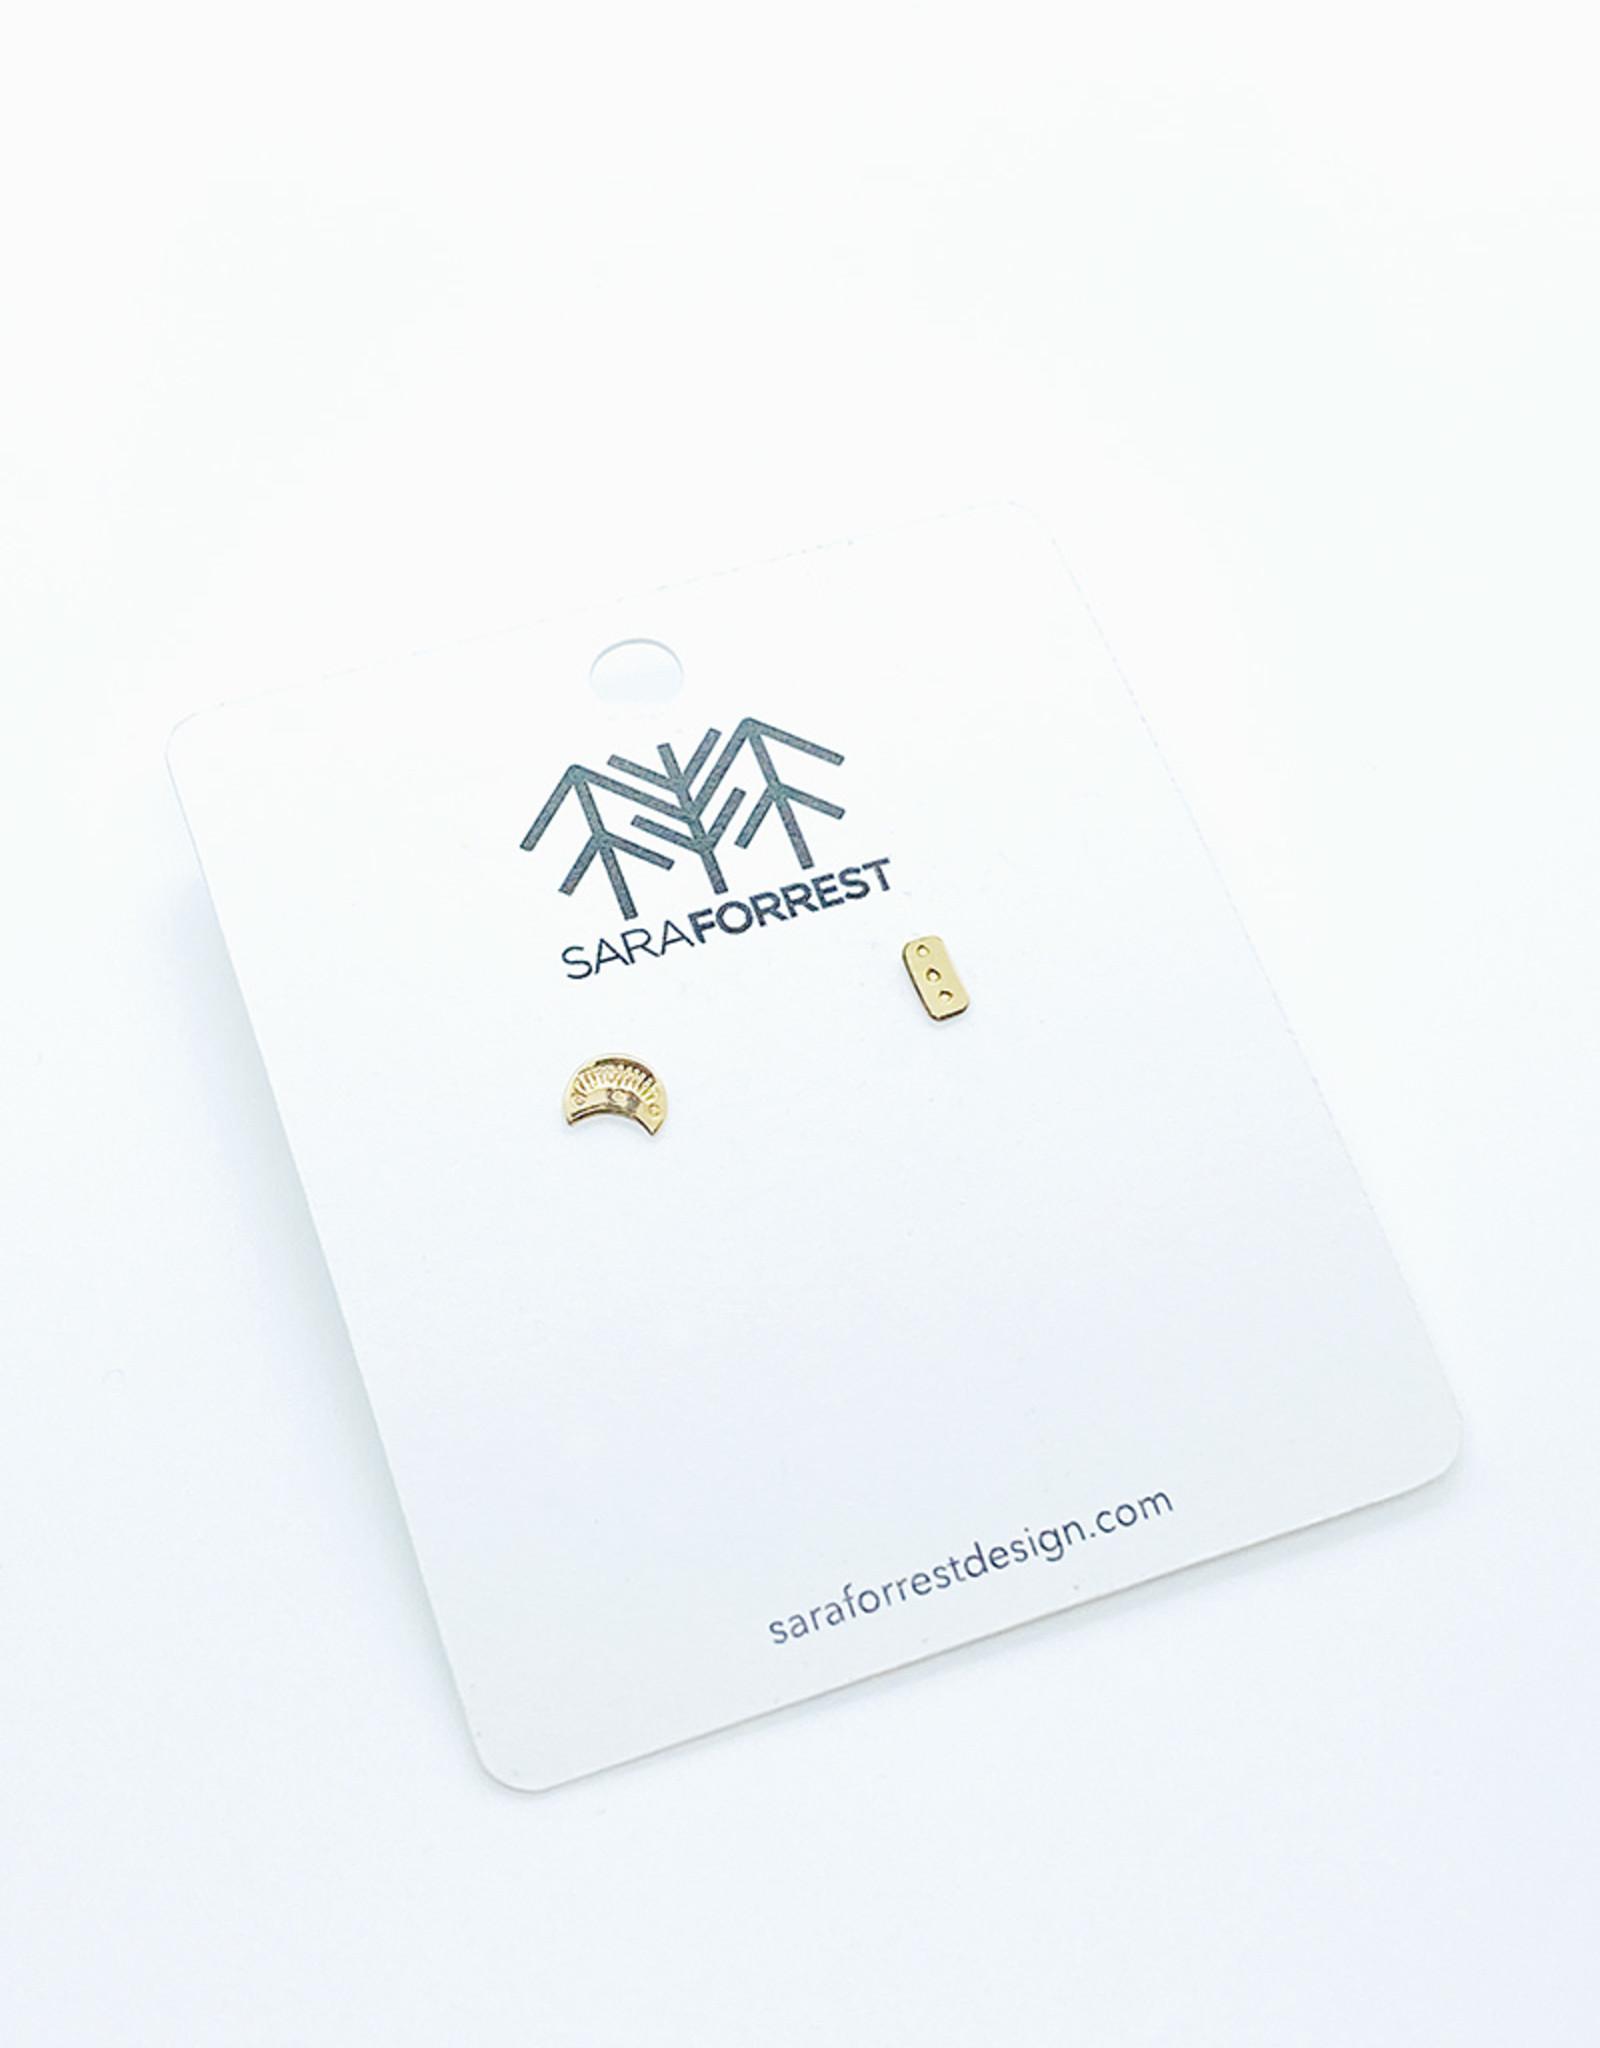 sara forrest design Mix Match Gold Filled Earrings by Sara Forrest Design